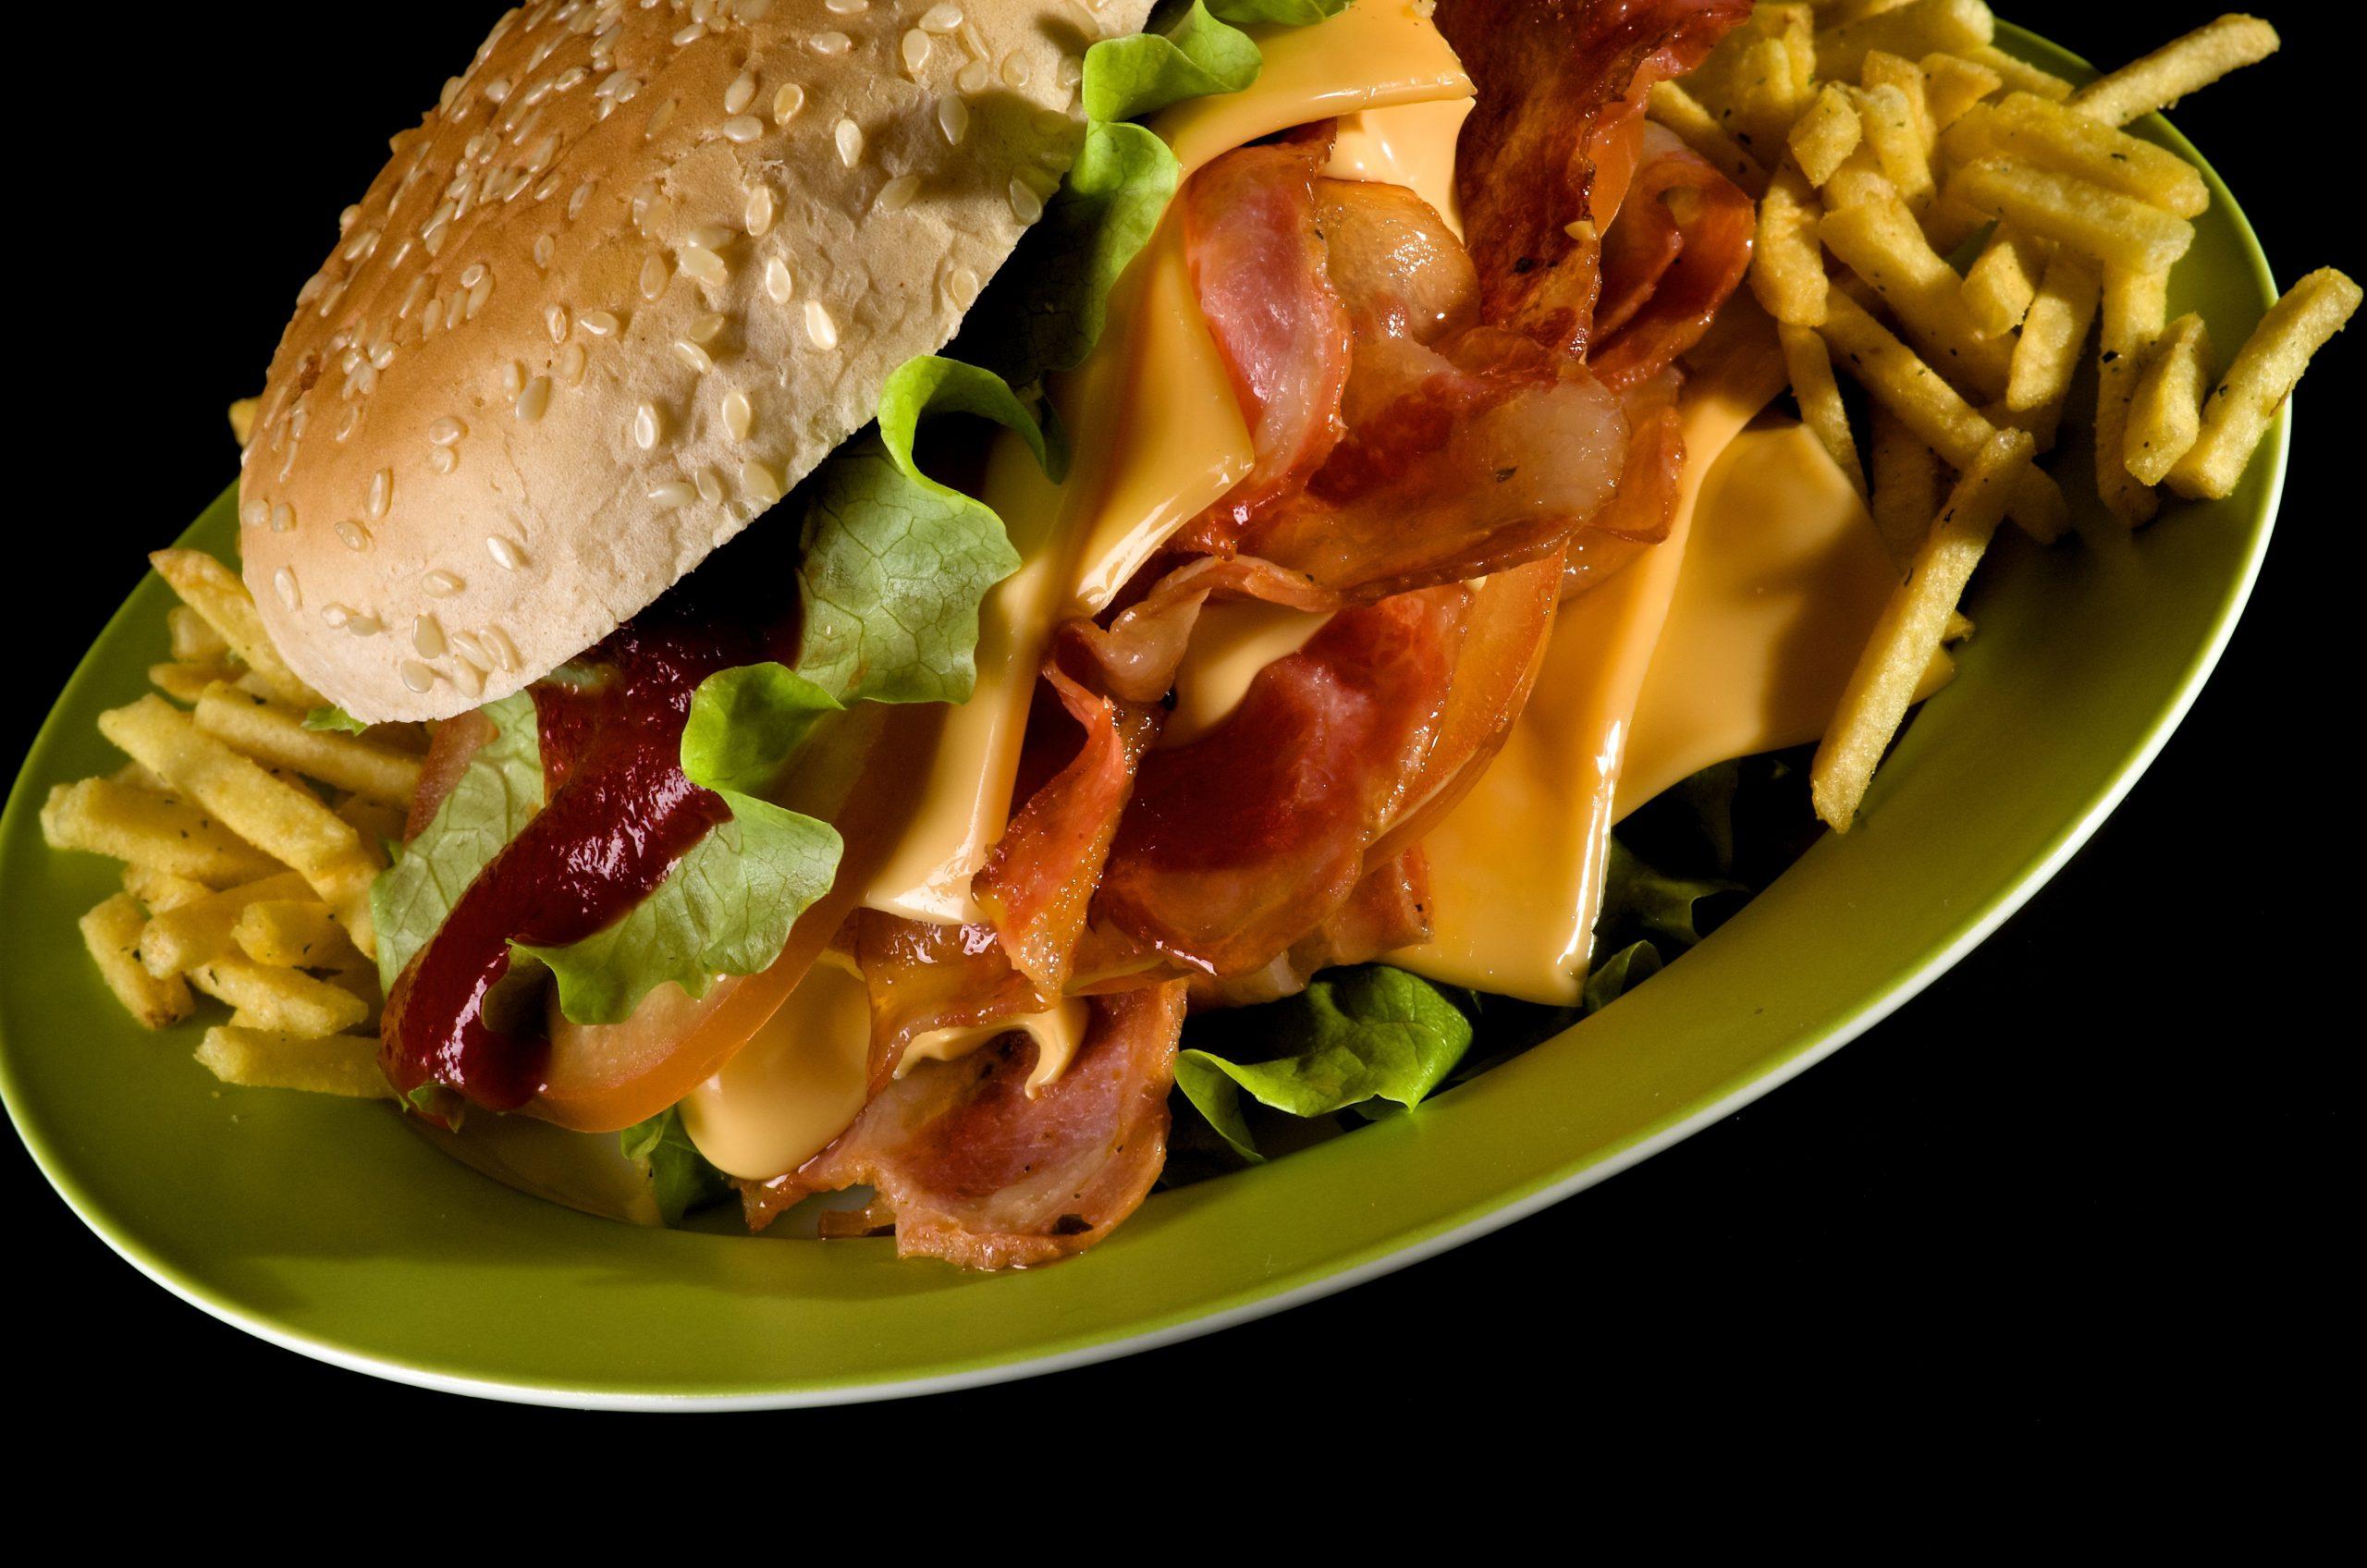 food & Obesity